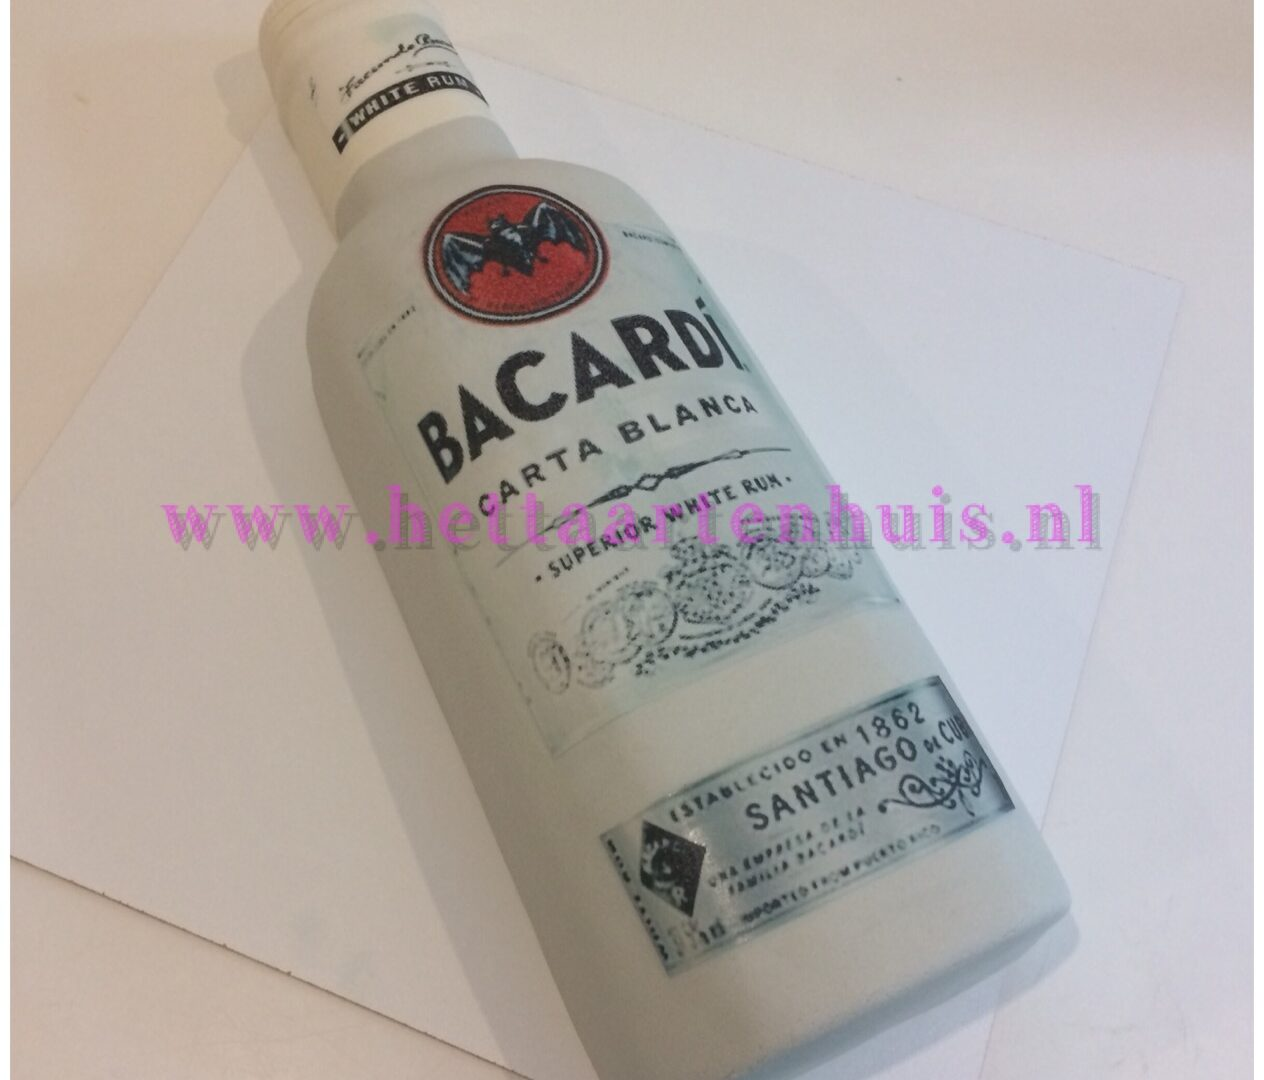 Bacardi fles taart